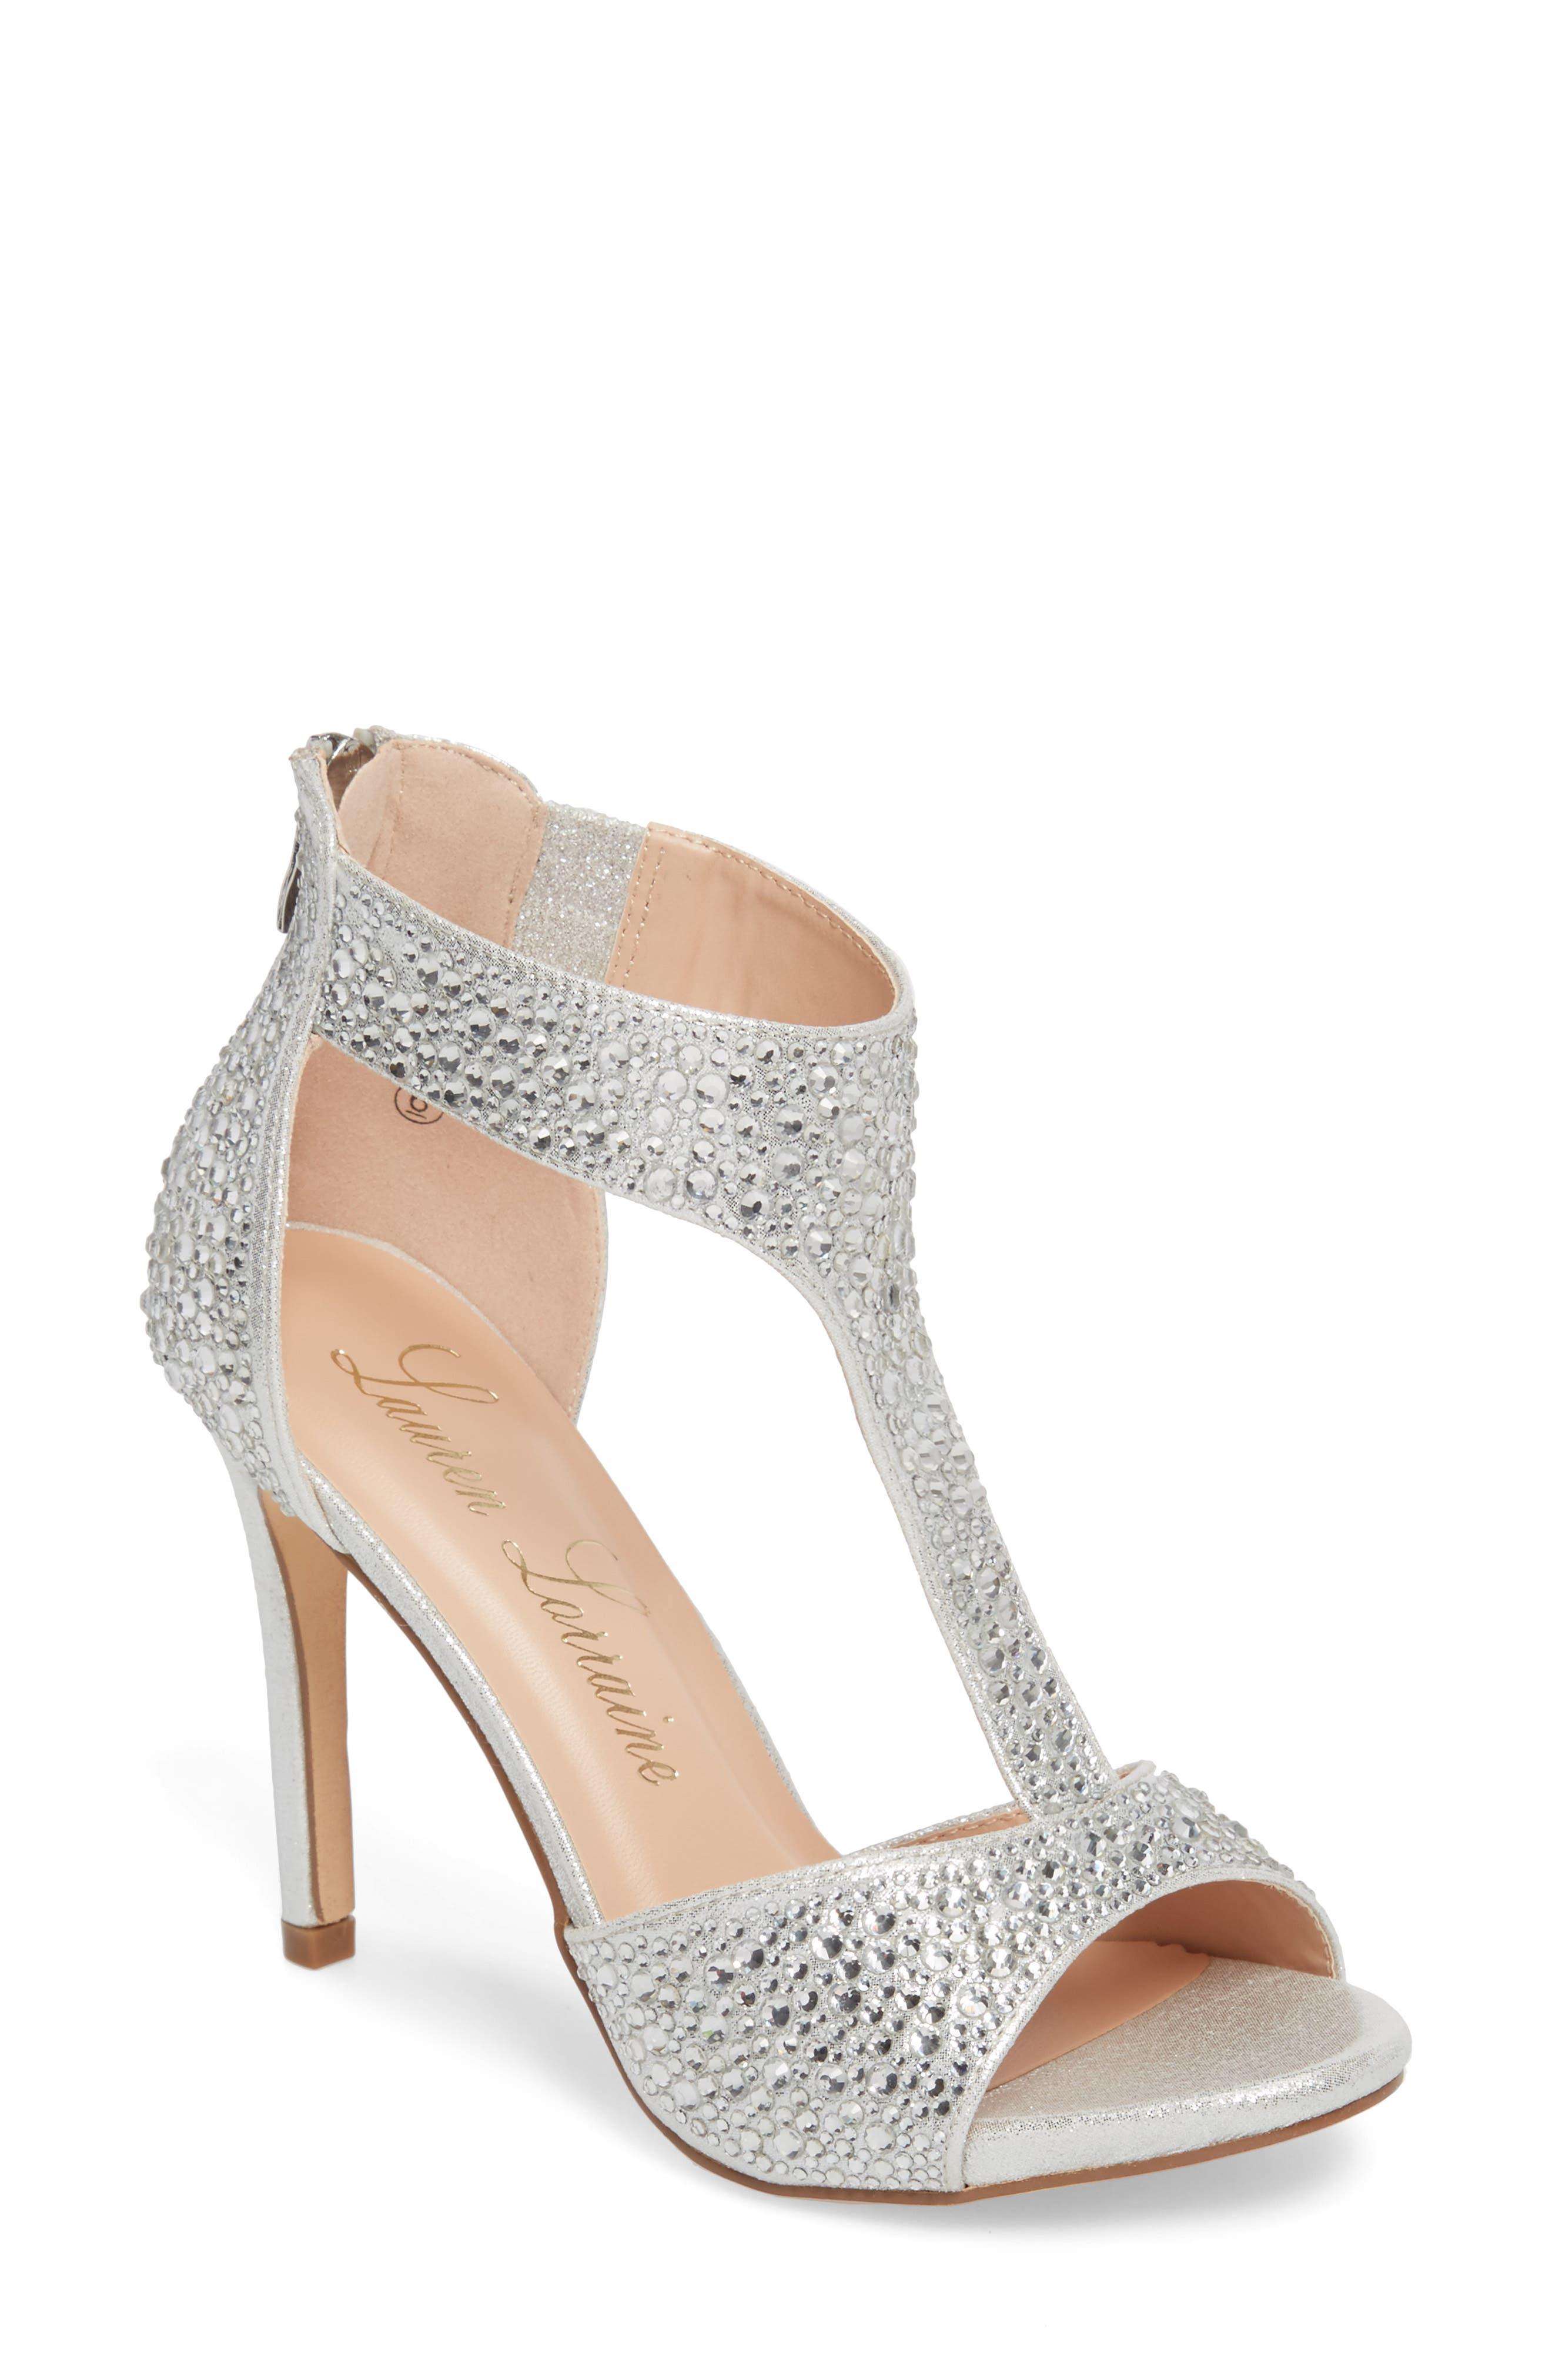 Ina Crystal Embellished Sandal,                             Main thumbnail 1, color,                             Silver